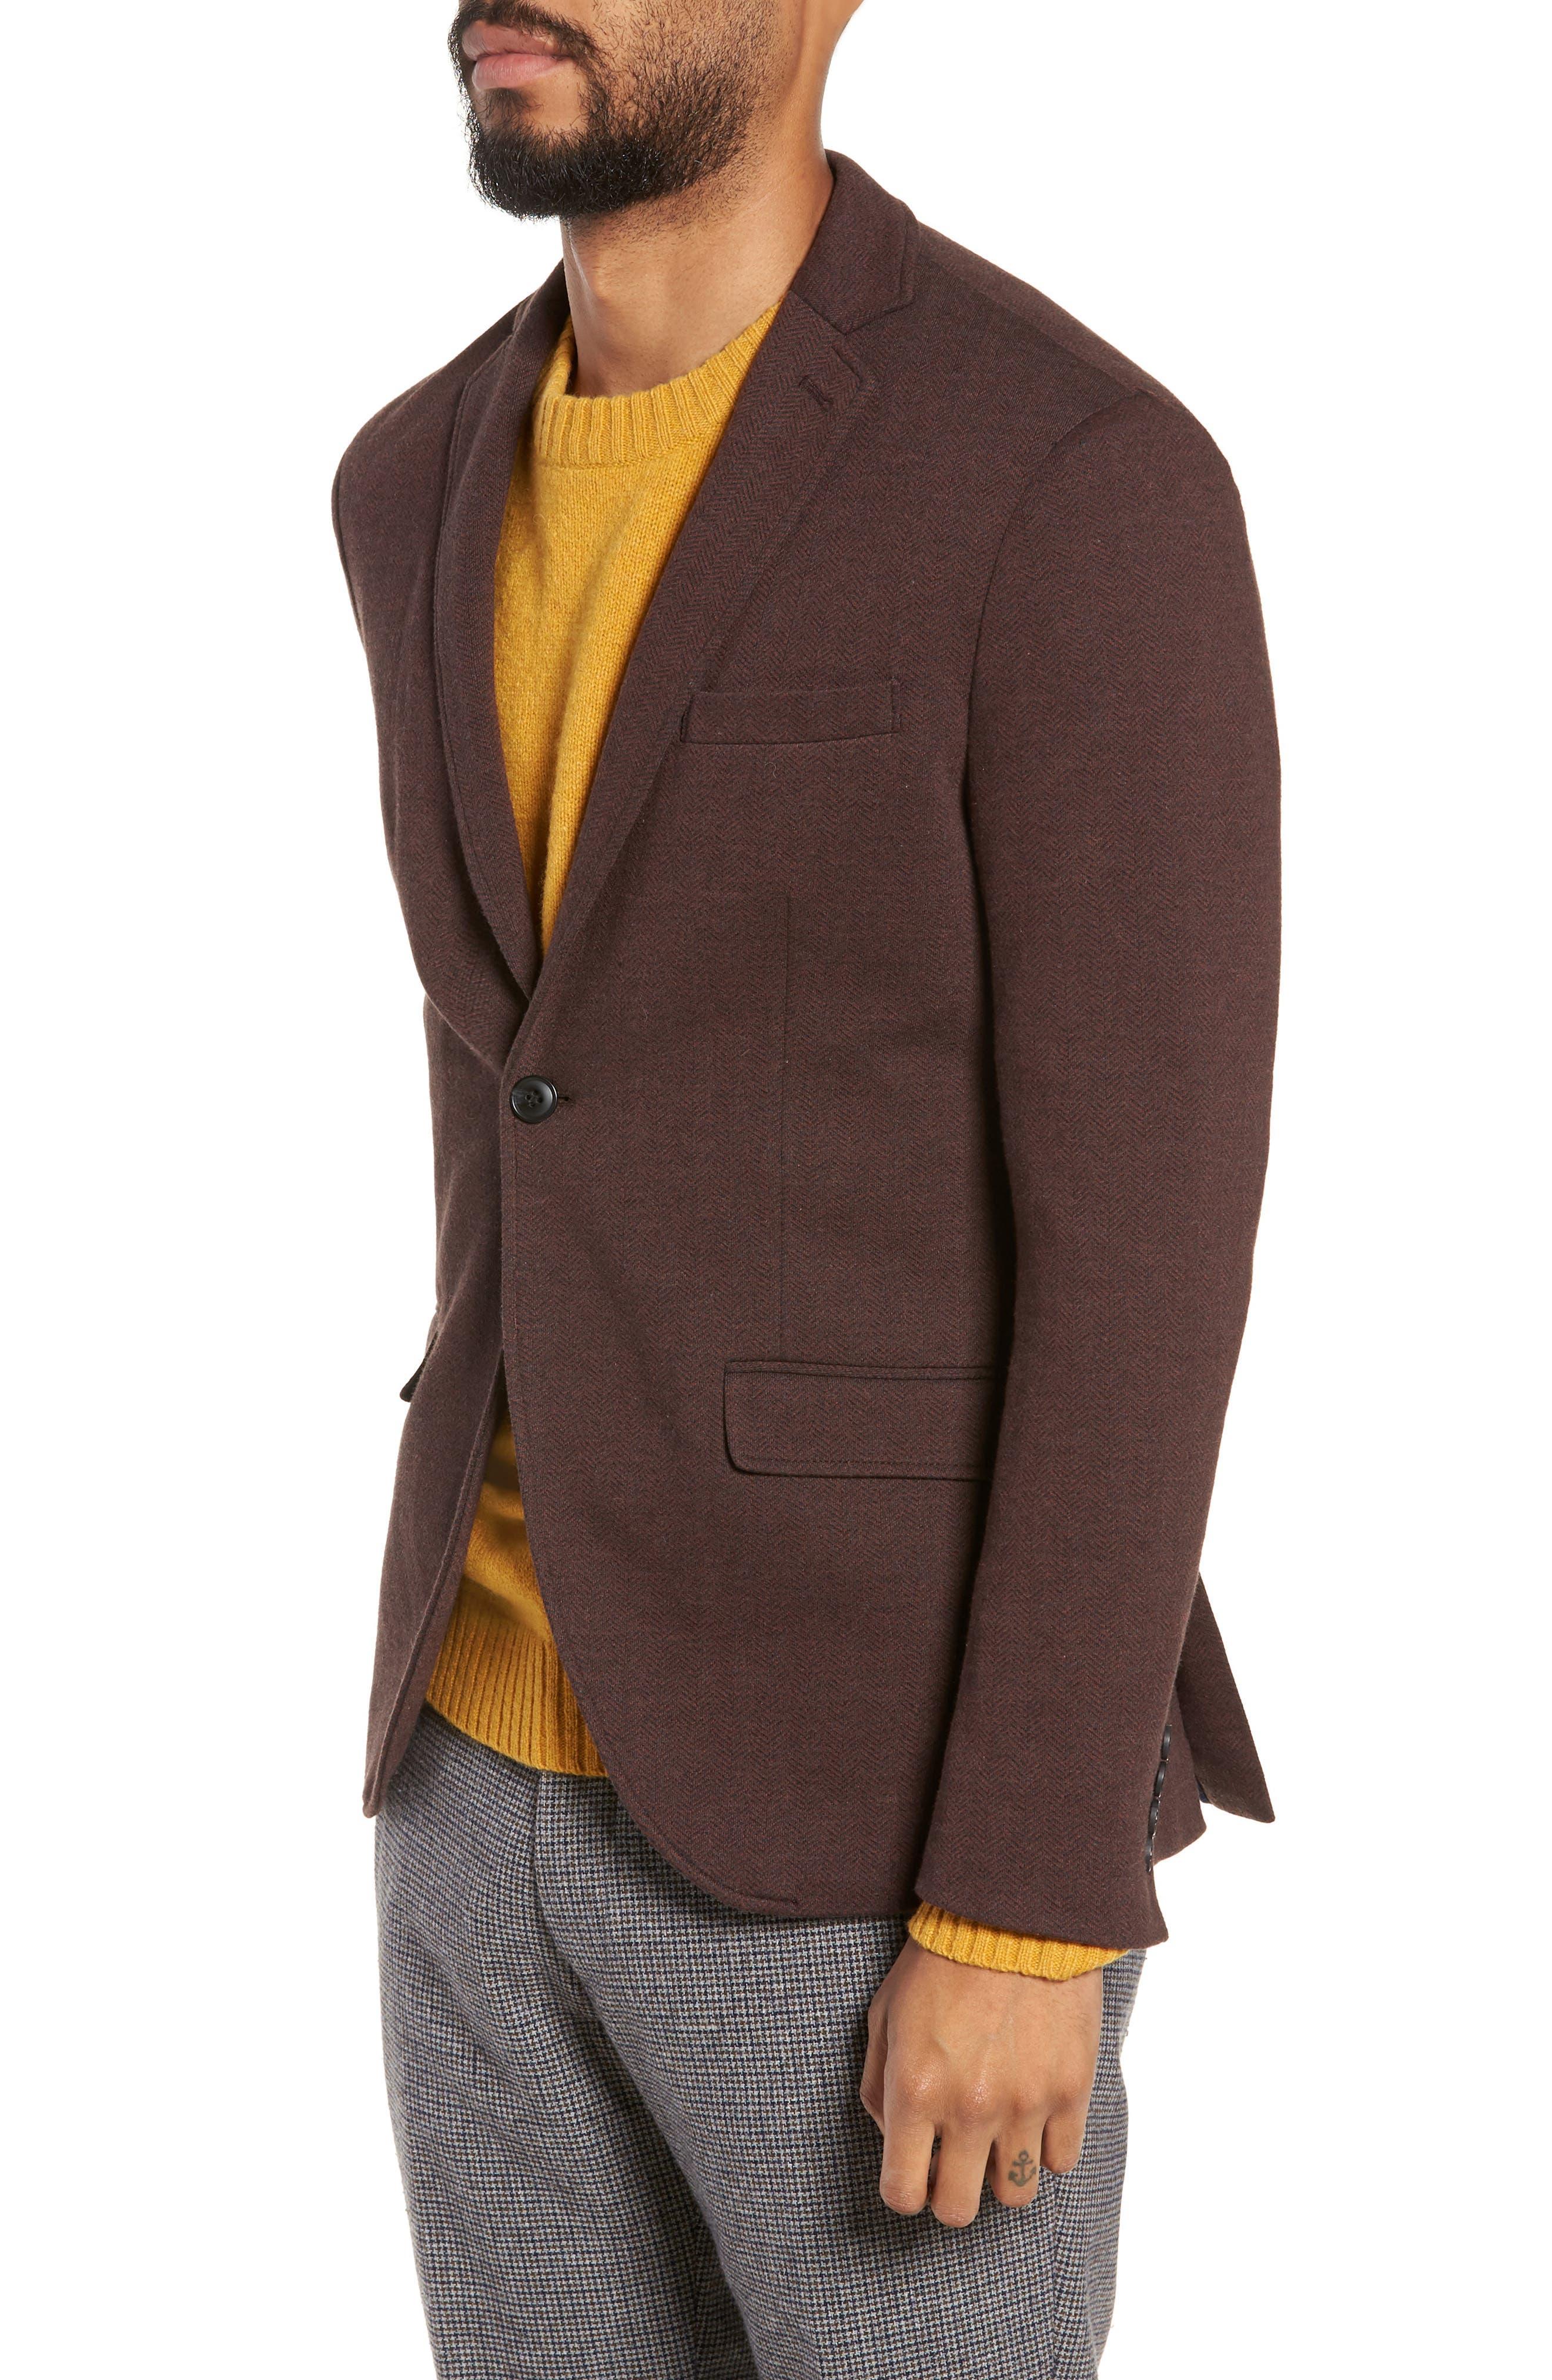 Herrold Slim Fit Herringbone Jersey Sport Coat,                             Alternate thumbnail 3, color,                             205